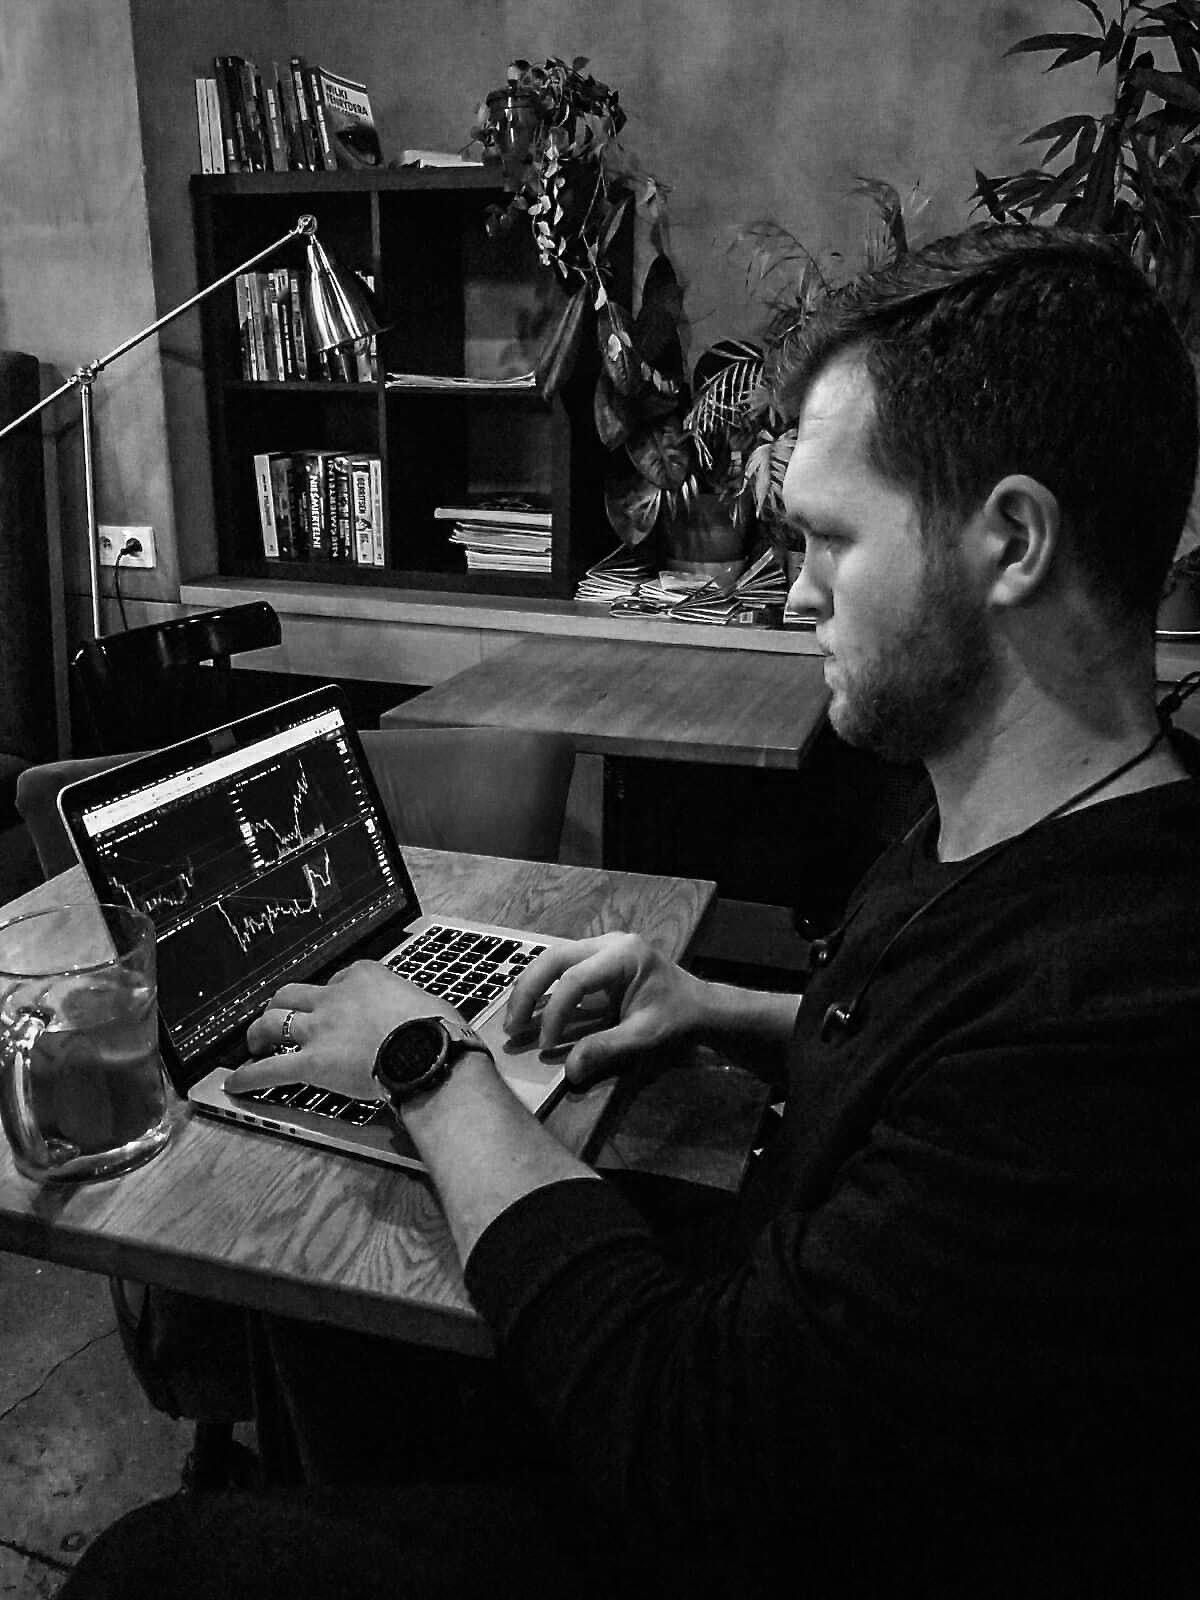 Jakub living the laptop lifestyle